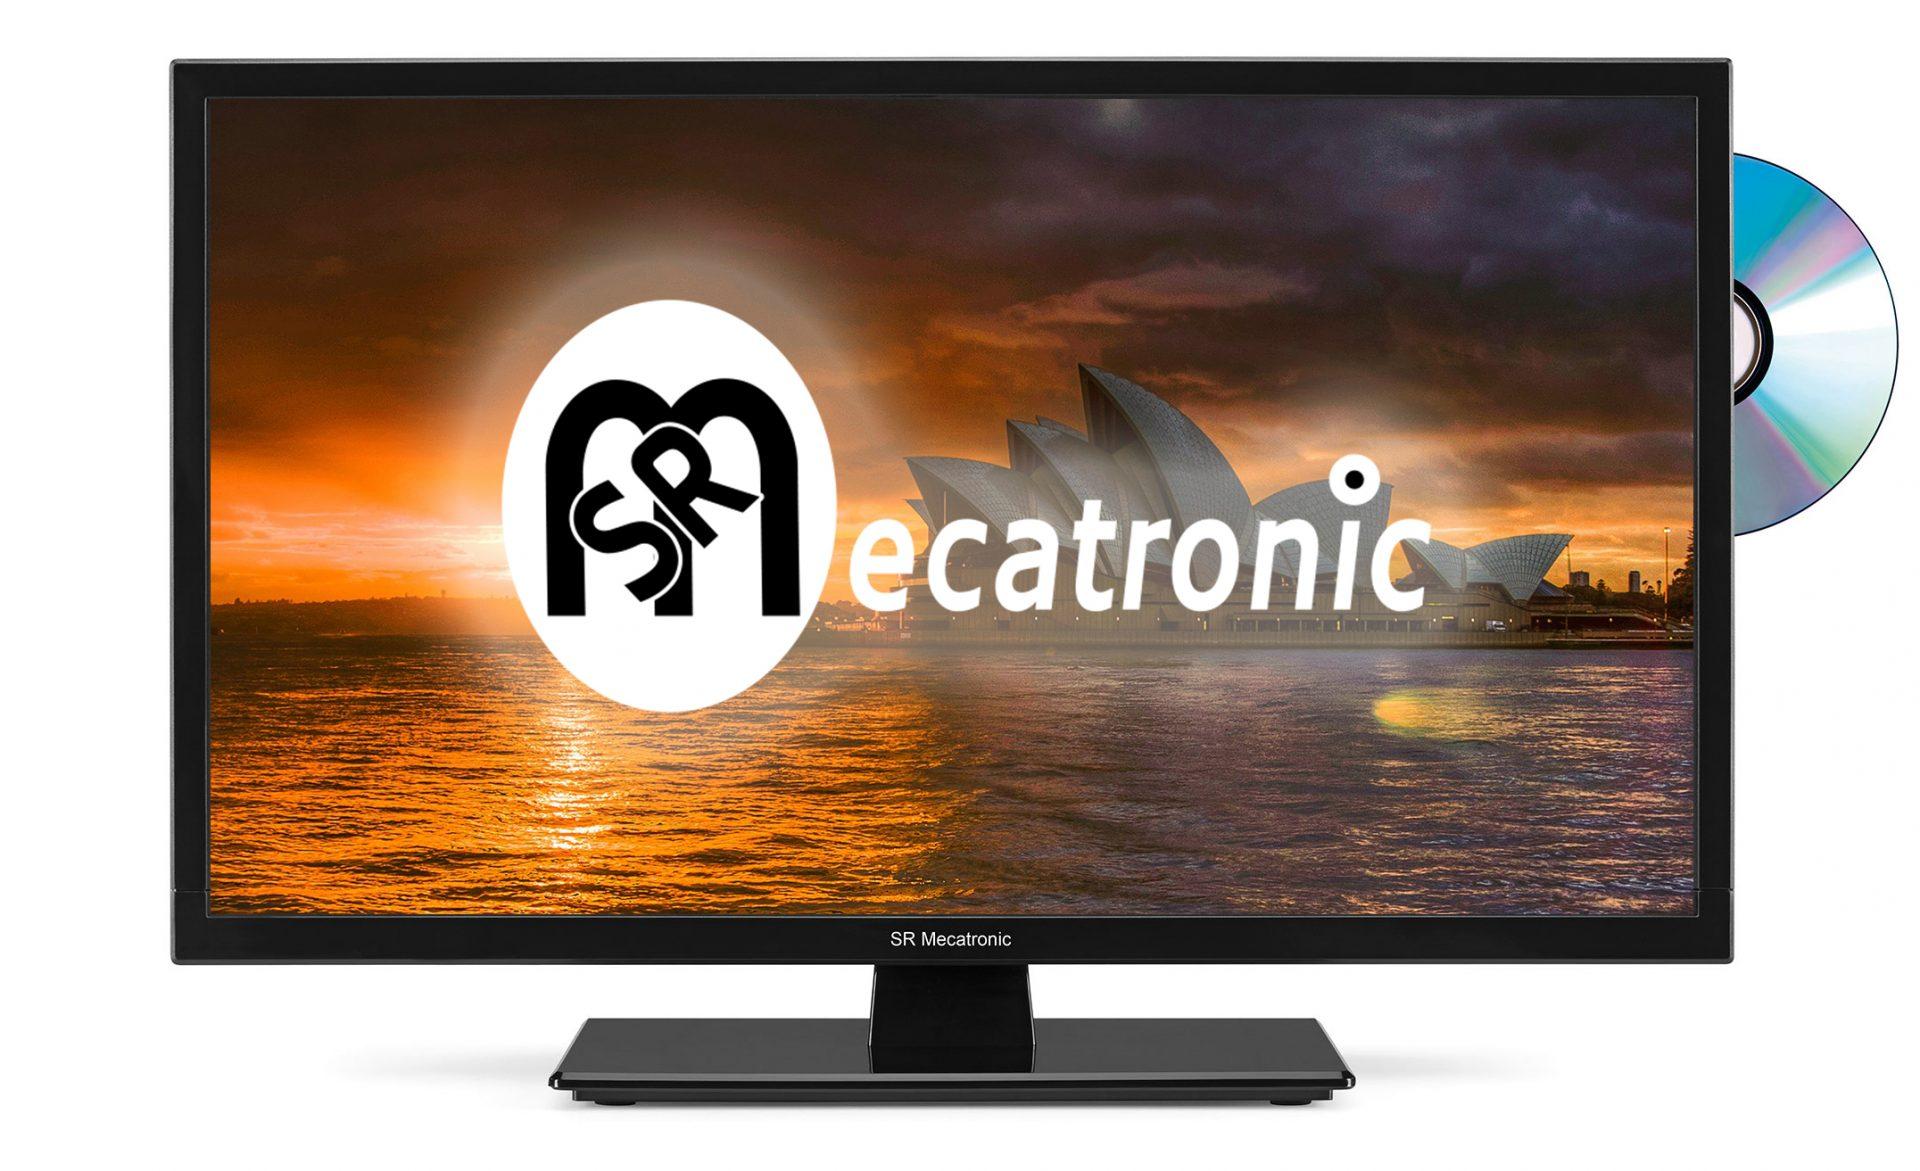 Carrelli Porta Tv Led.Tv Led Mecatronic Sr Tv 20 Sat Dvd Grosso Vacanze